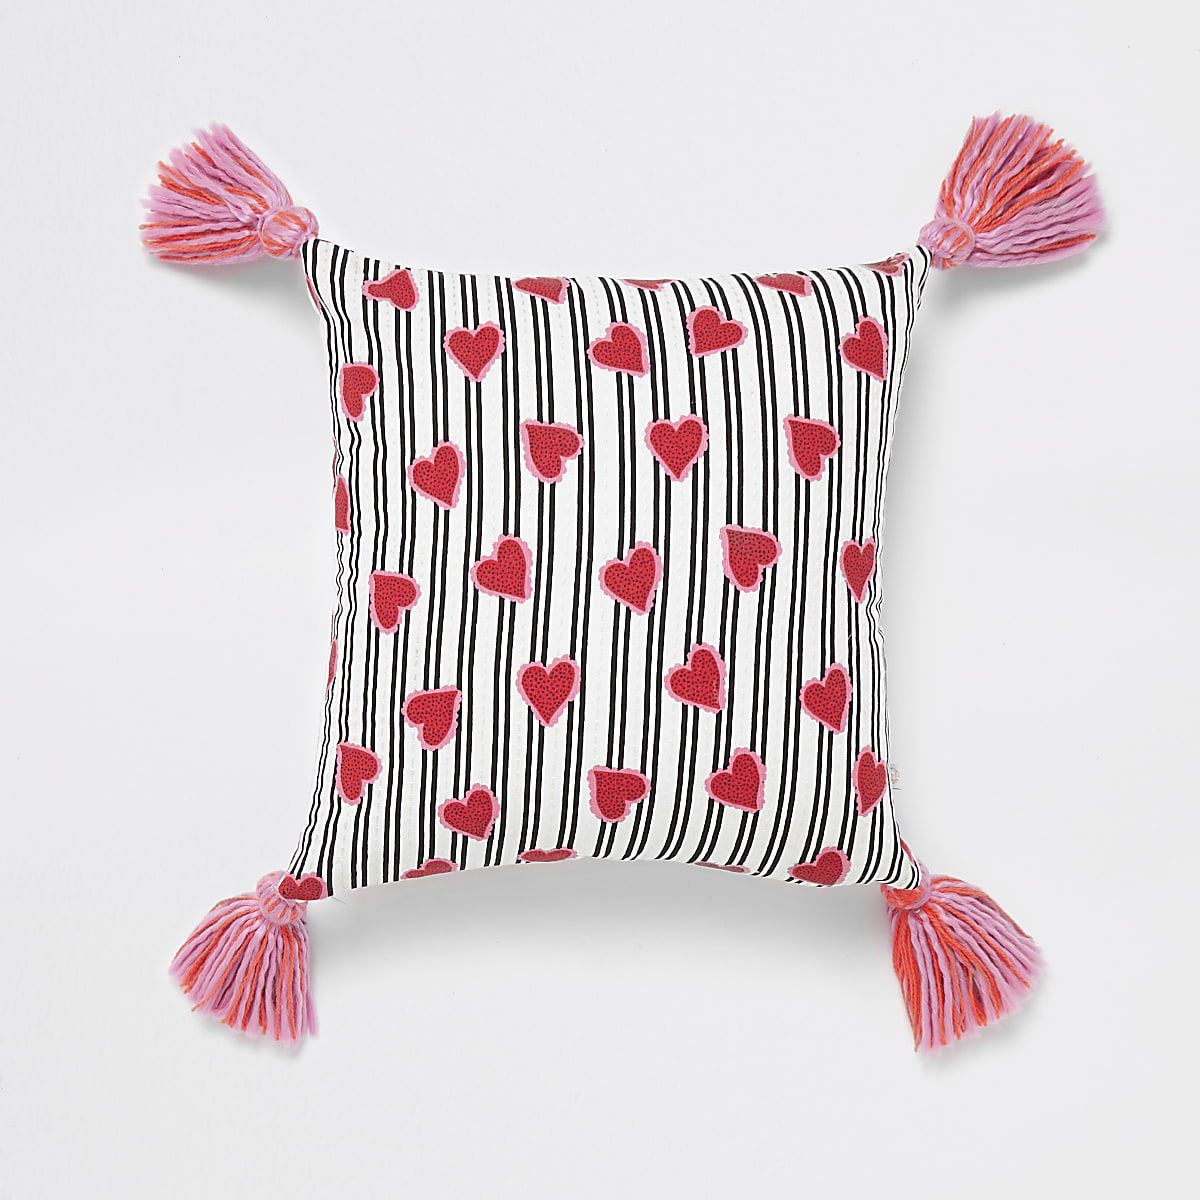 White heart print cushion with tassels